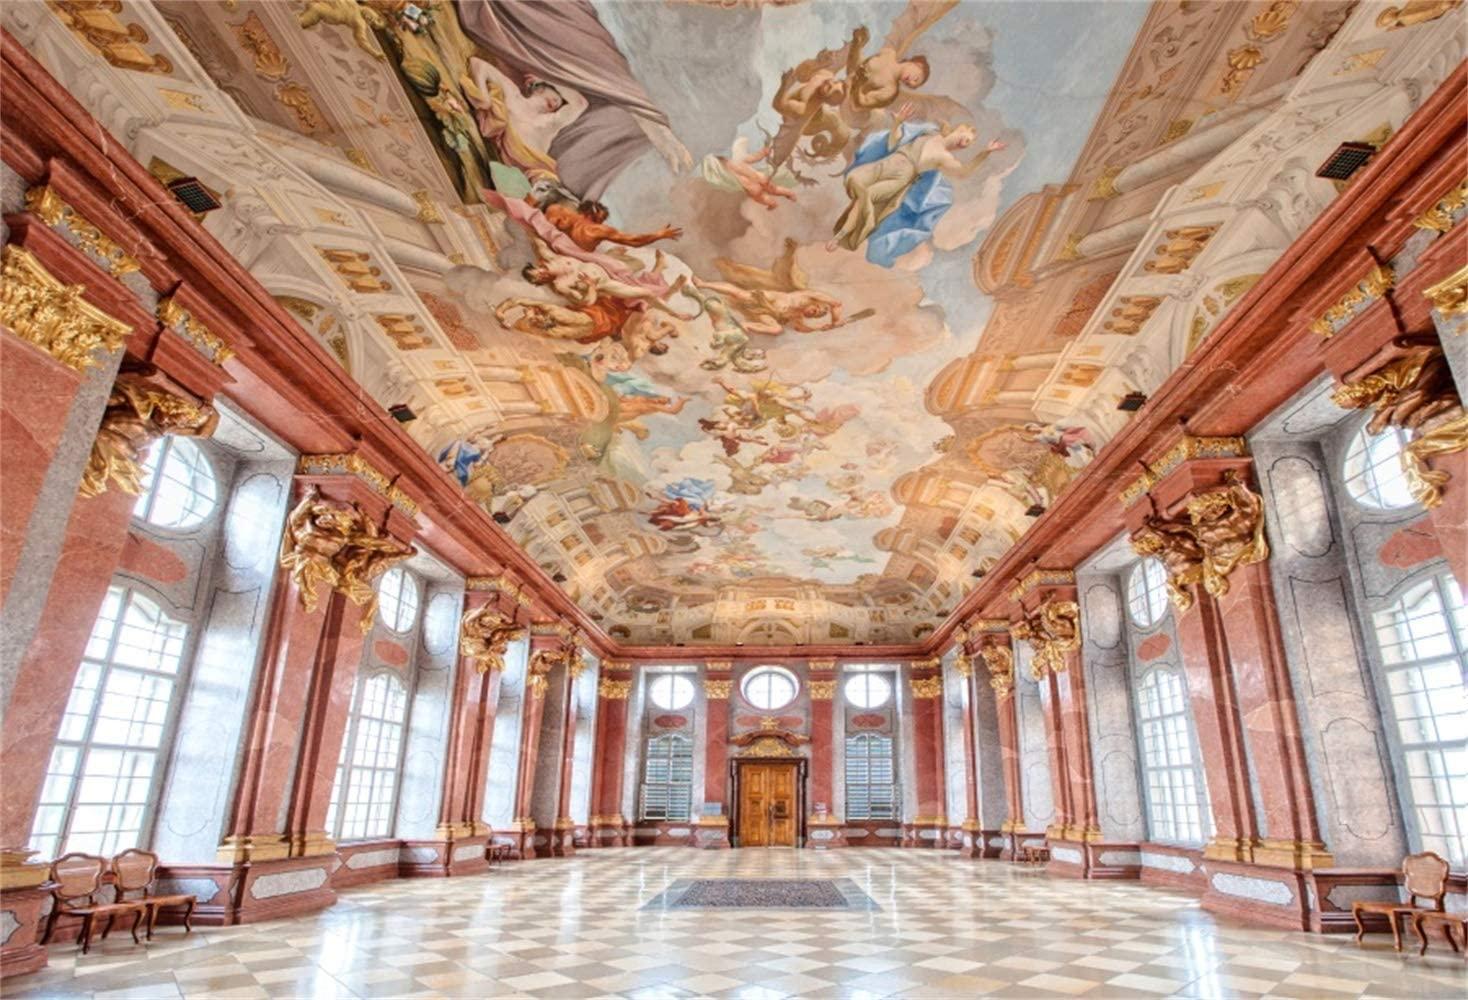 Amazoncom Laeacco 10x7ft Vintage Palace Interior Vinyl 1468x1000